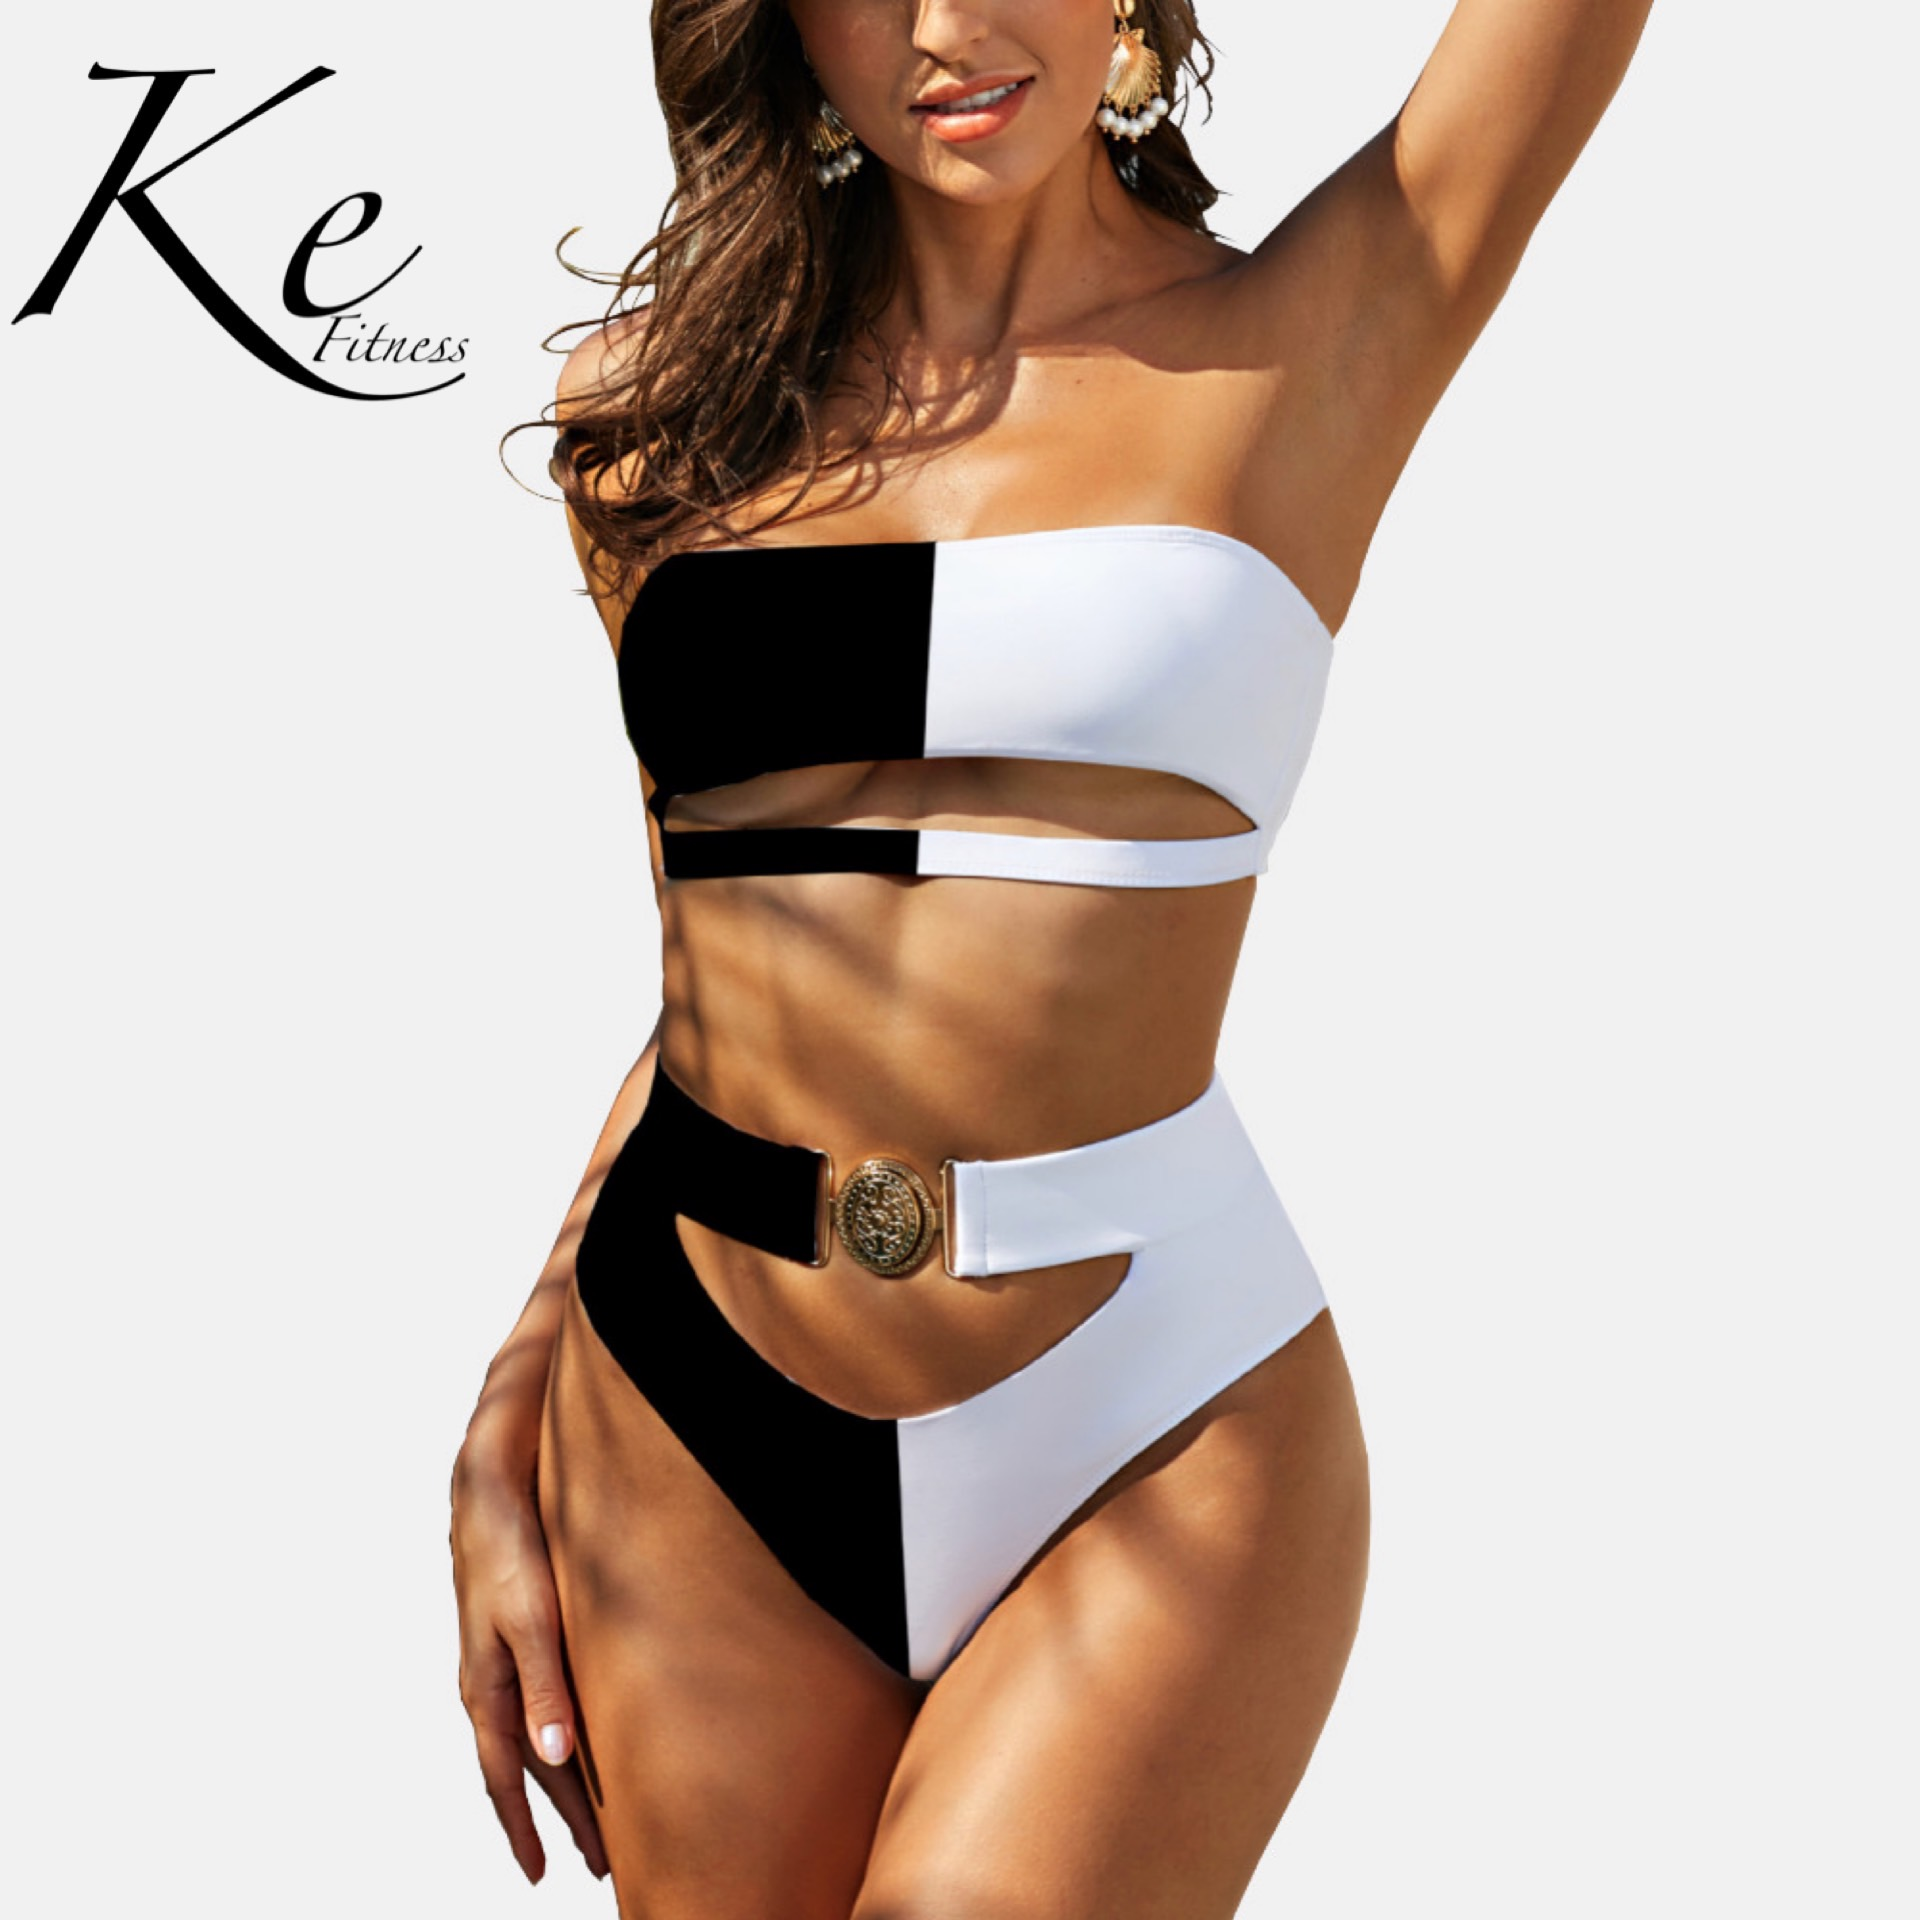 KE Collection 2020 exquisite swimwear metal buckle women's swimsuit tube top bandage bikini 2 pieces high waist black white pink 1